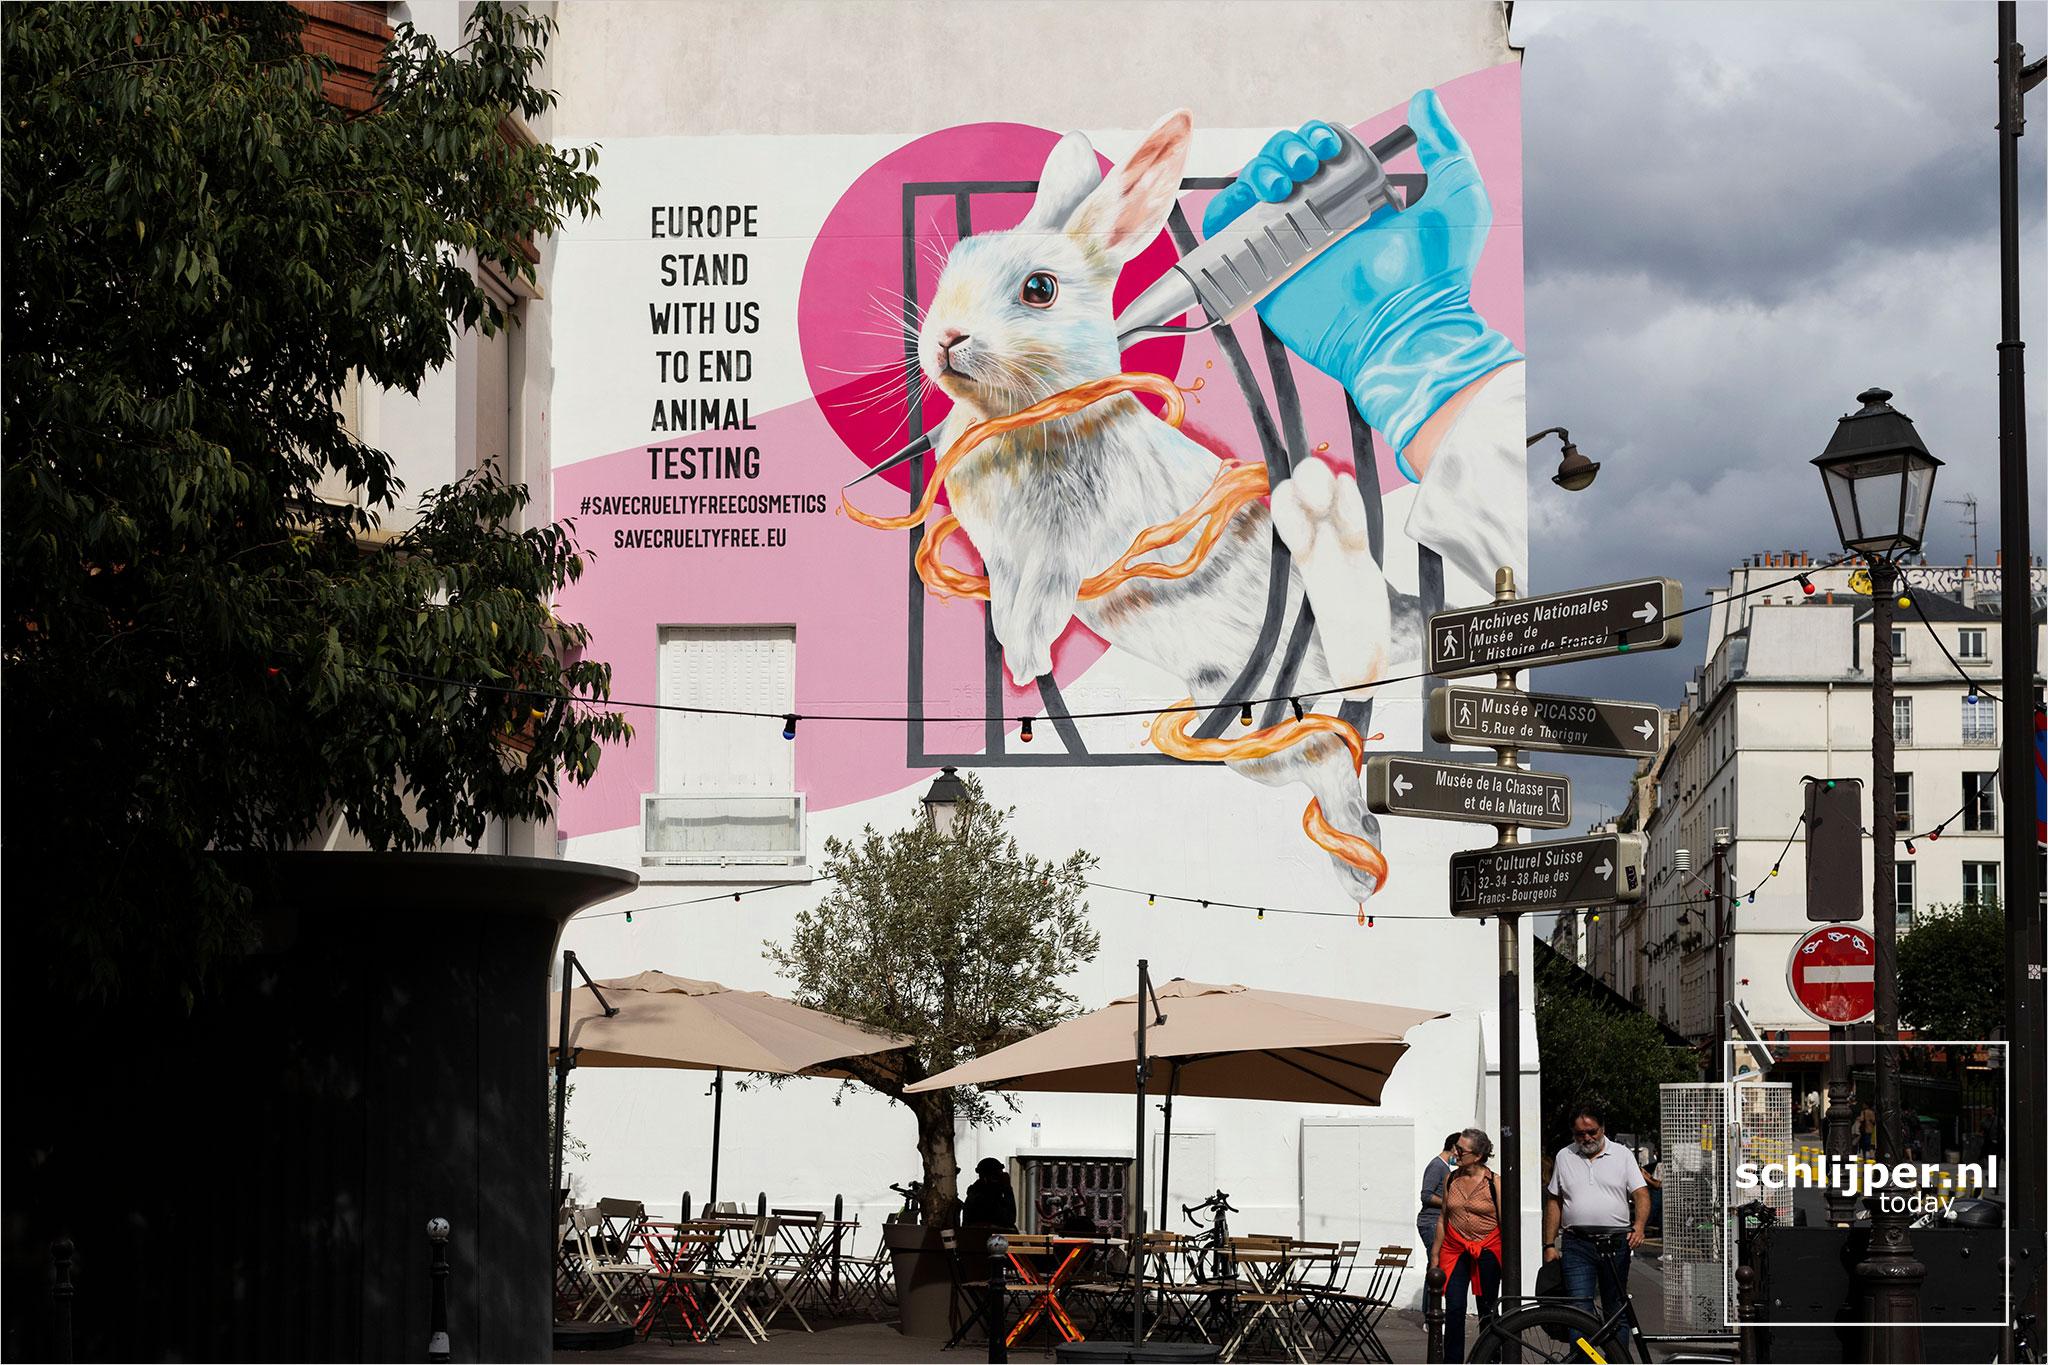 France, Paris, 14 september 2021